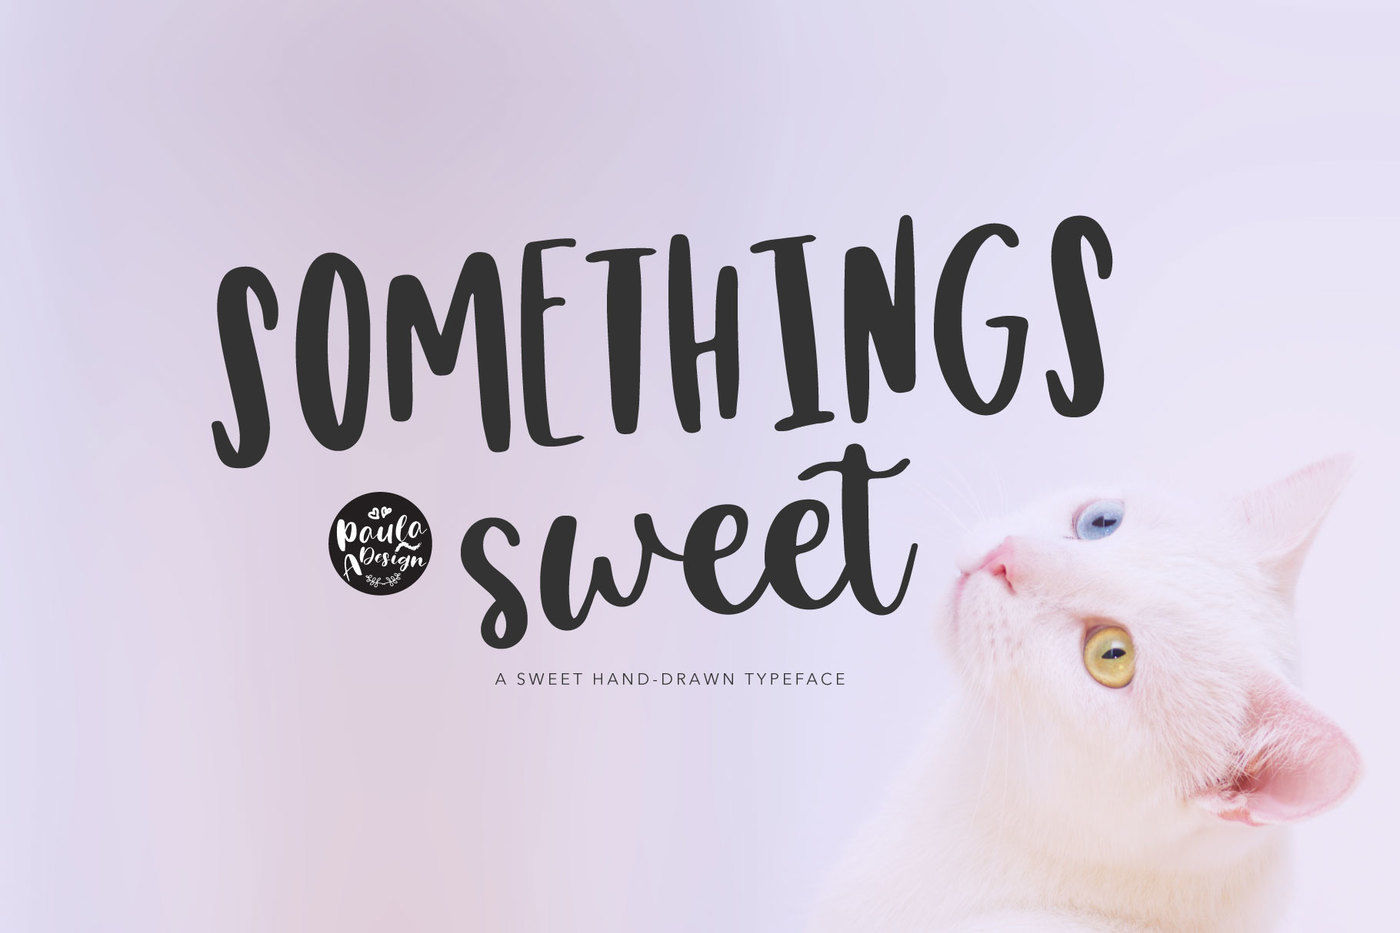 Somethings Sweet By Nursery Art Thehungryjpeg Com